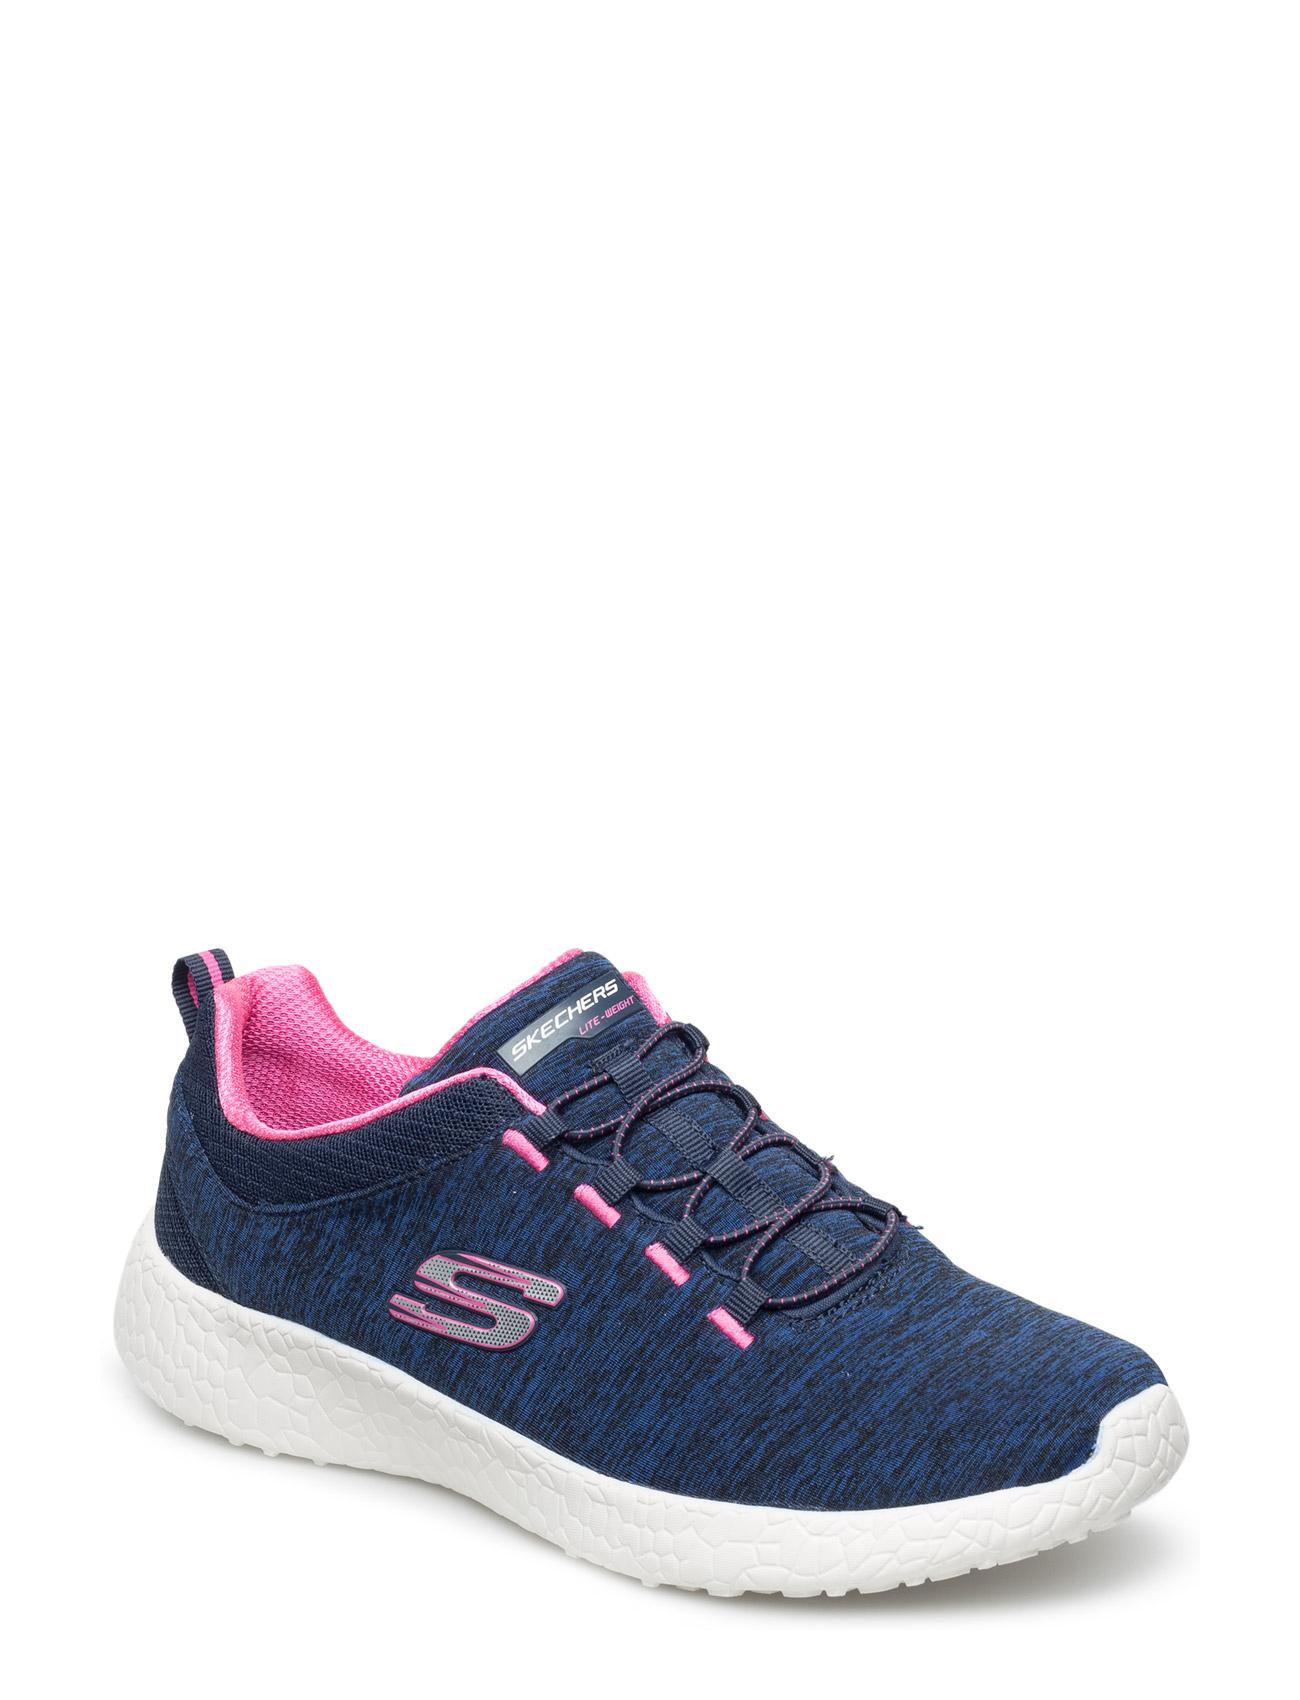 Skechers Burst - Equinox Skechers Sneakers til Kvinder i